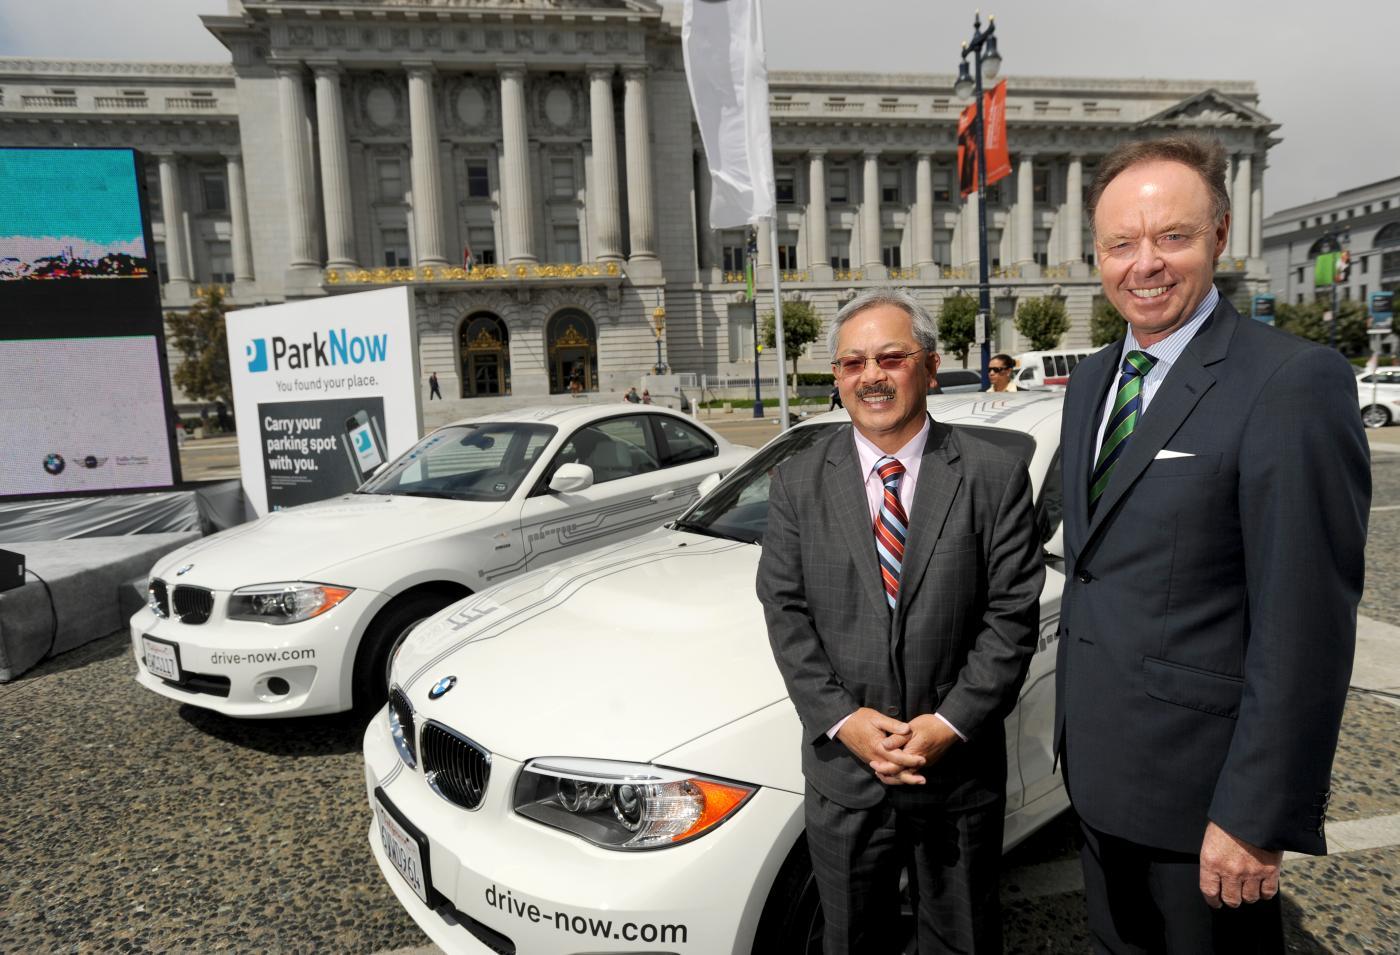 BMW Launches DriveNow Car Sharing Program in San Francisco